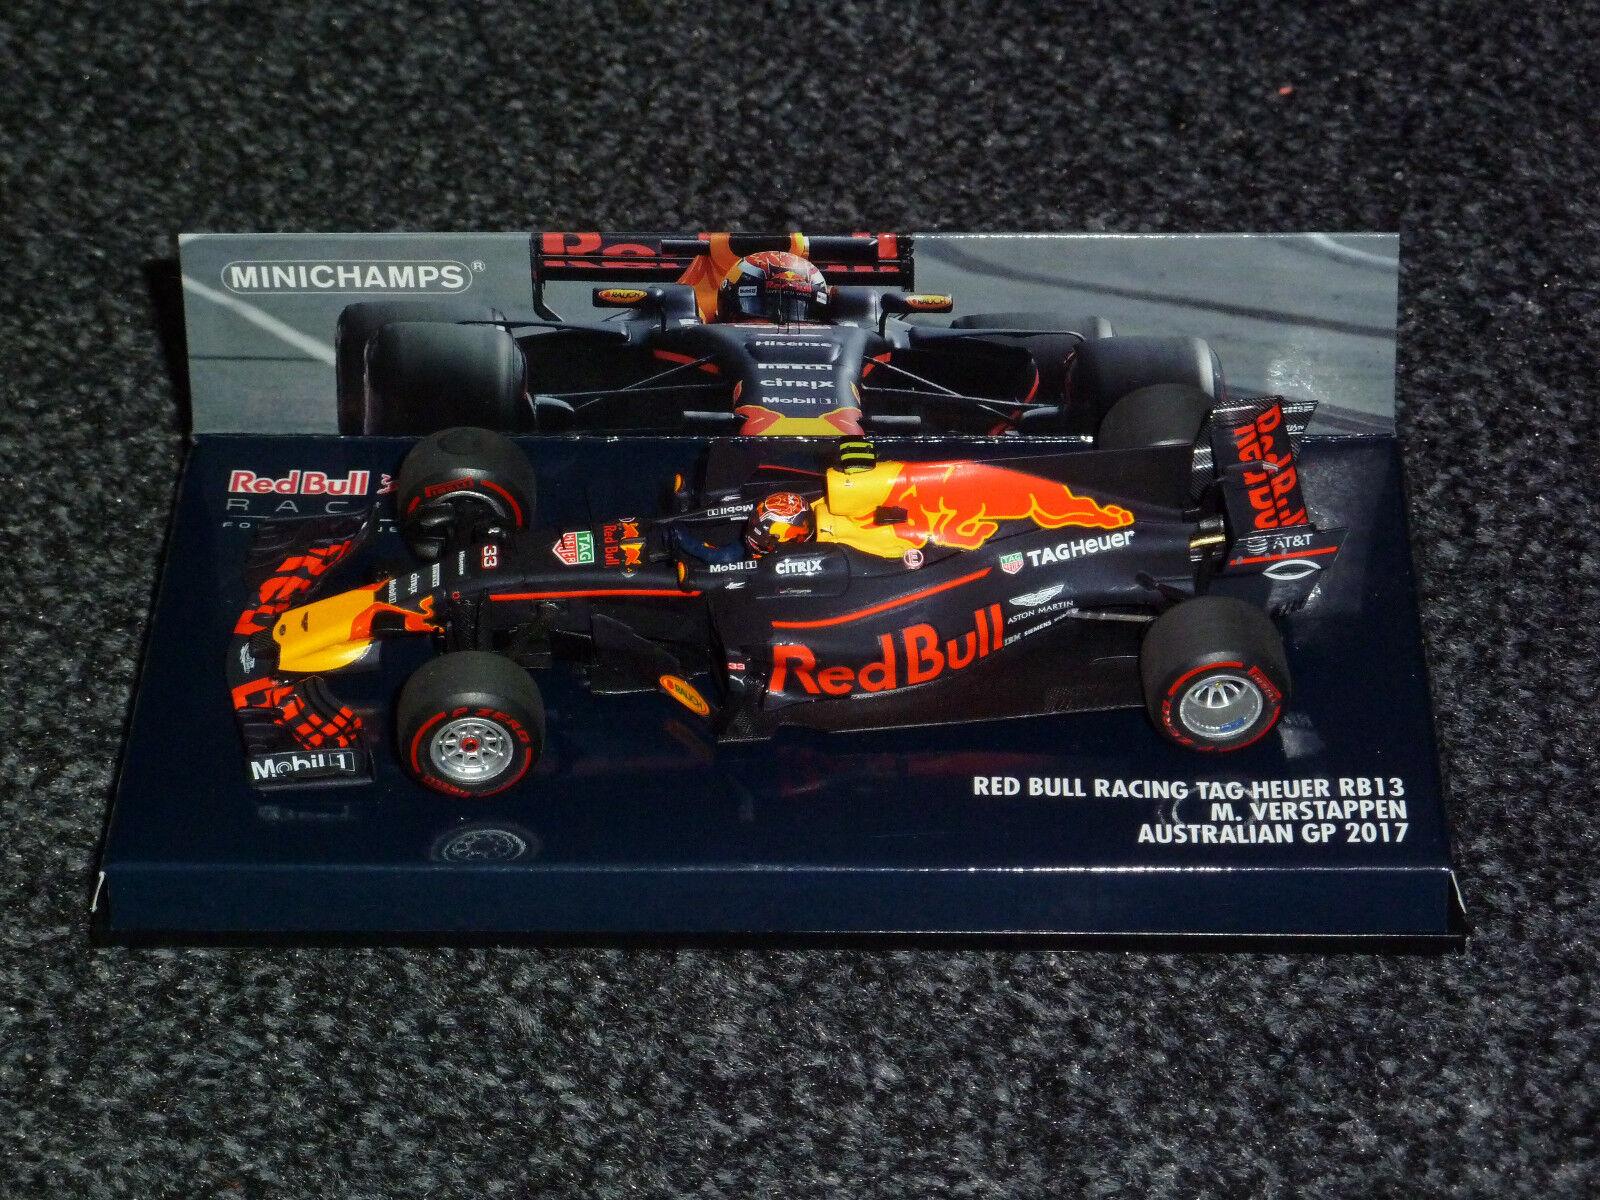 Minichamps 1 43 Max Verstappen rosso Bull Racing RB13 GP Australië Australia